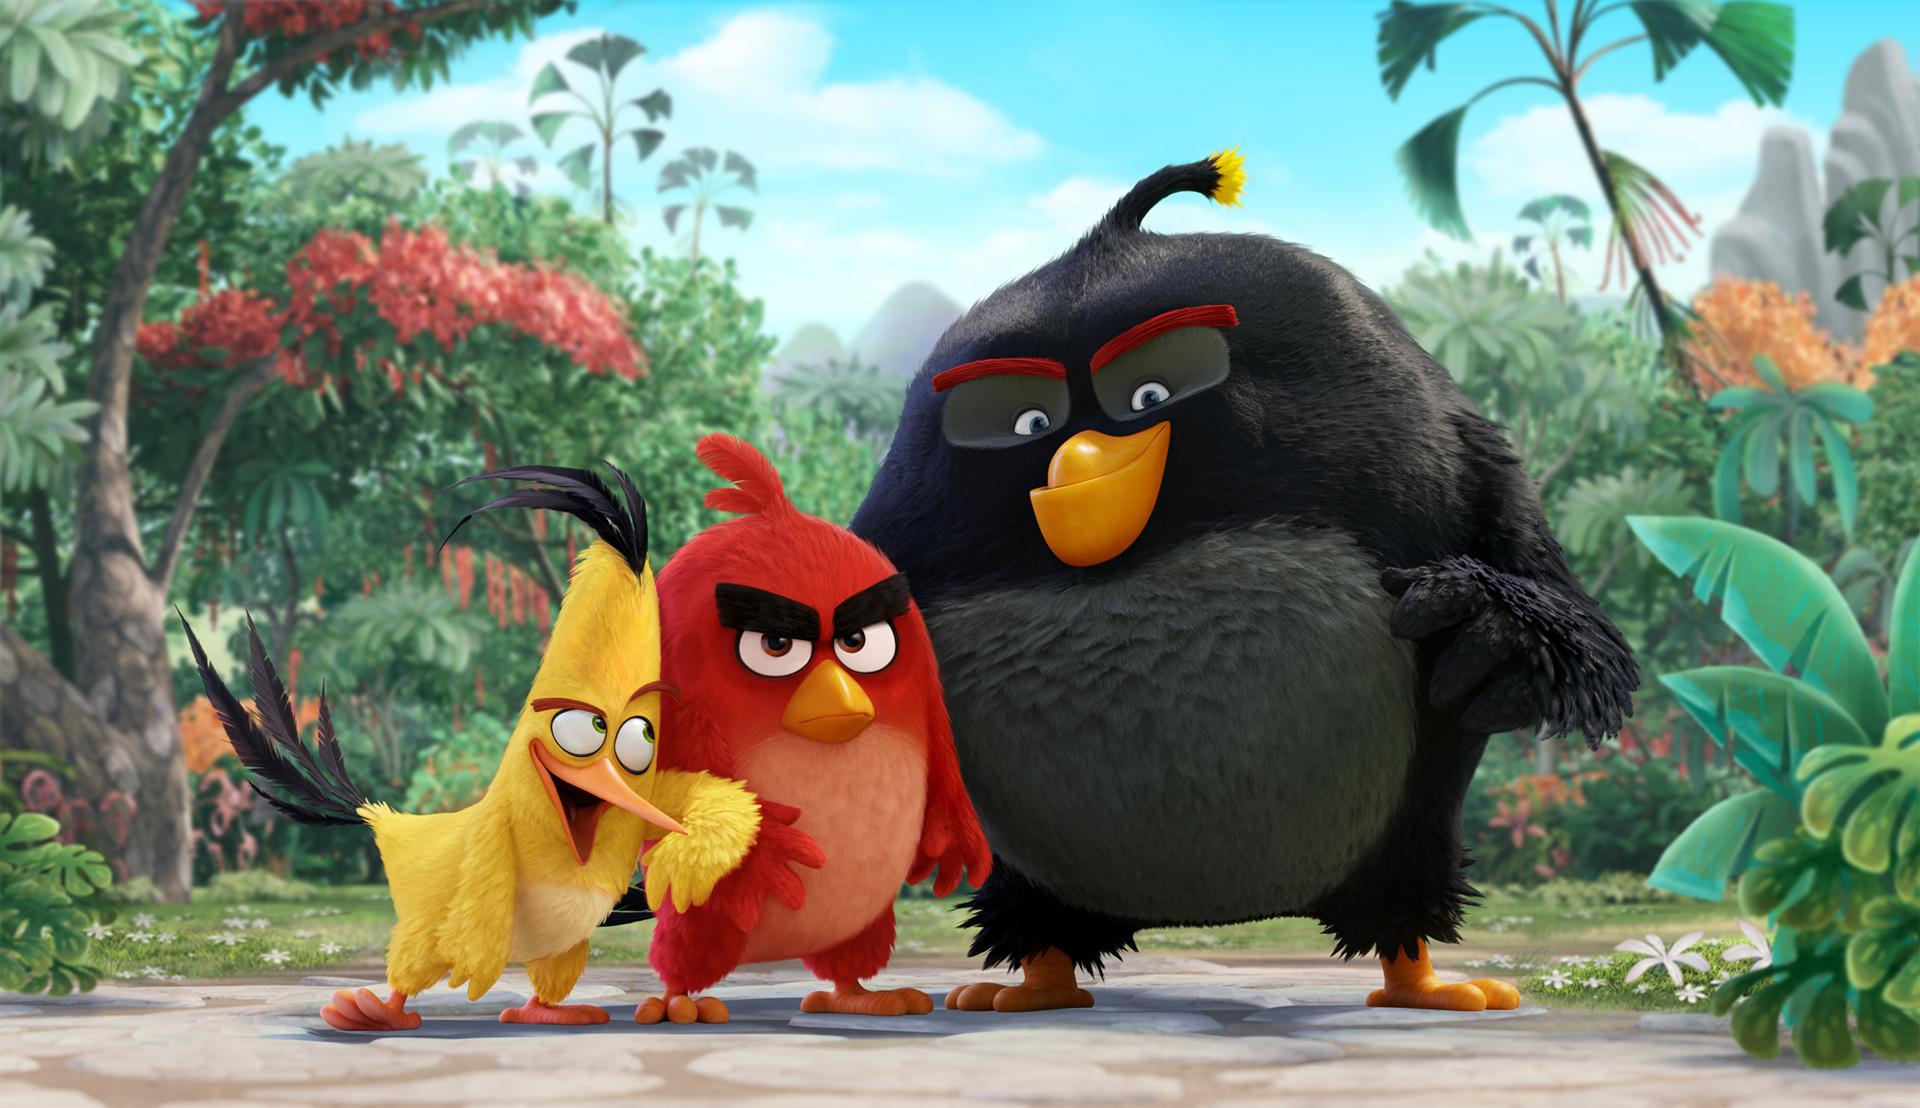 Quadro M6000: Nvidia verdoppelt Videospeicher der Profi-Karte auf 24 GByte - The Angry Birds Movie (Bild: Sony Pictures Imageworks)